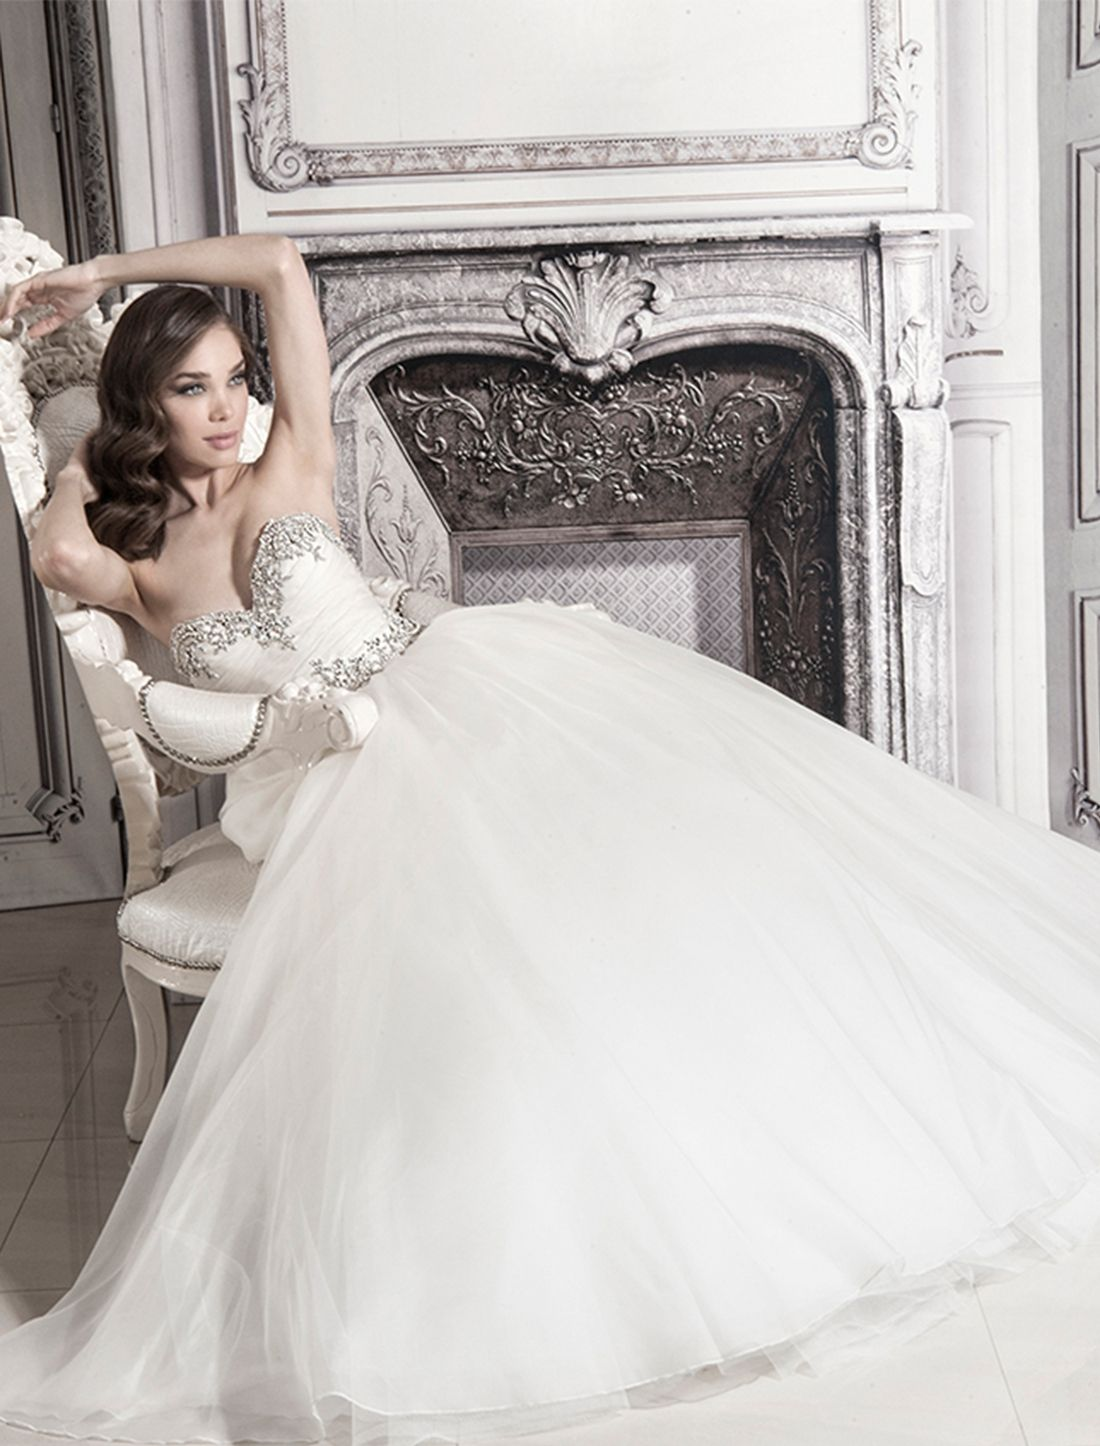 KleinfeldBridal.com: Pnina Tornai: Bridal Gown: 32848194: Princess ...